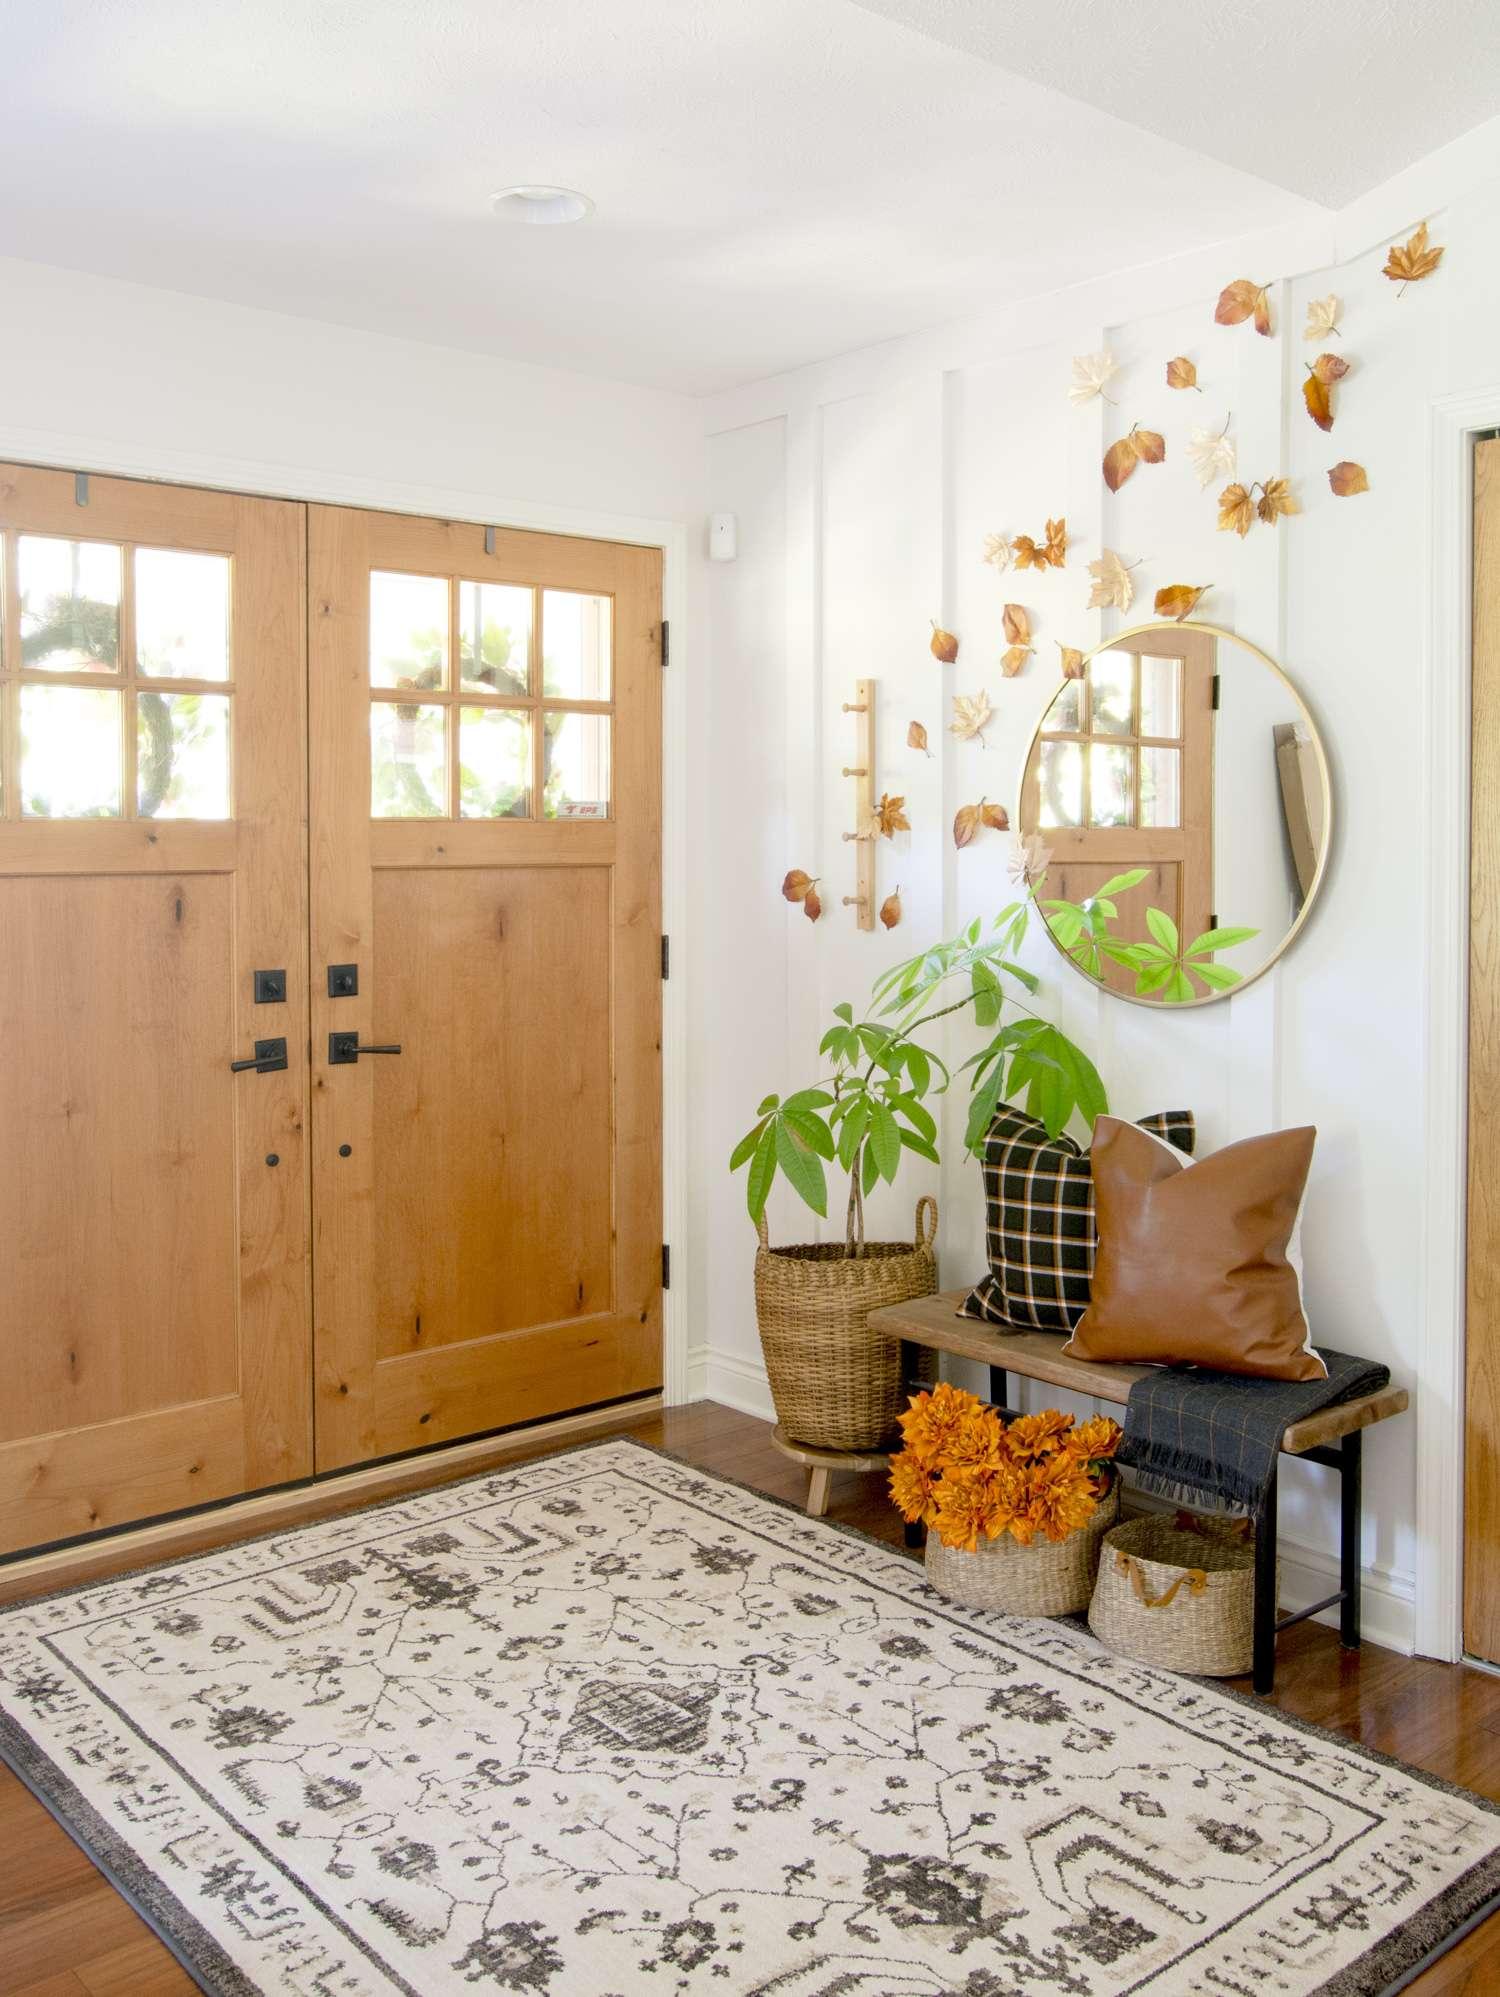 Farmhouse fall decor in an entryway.